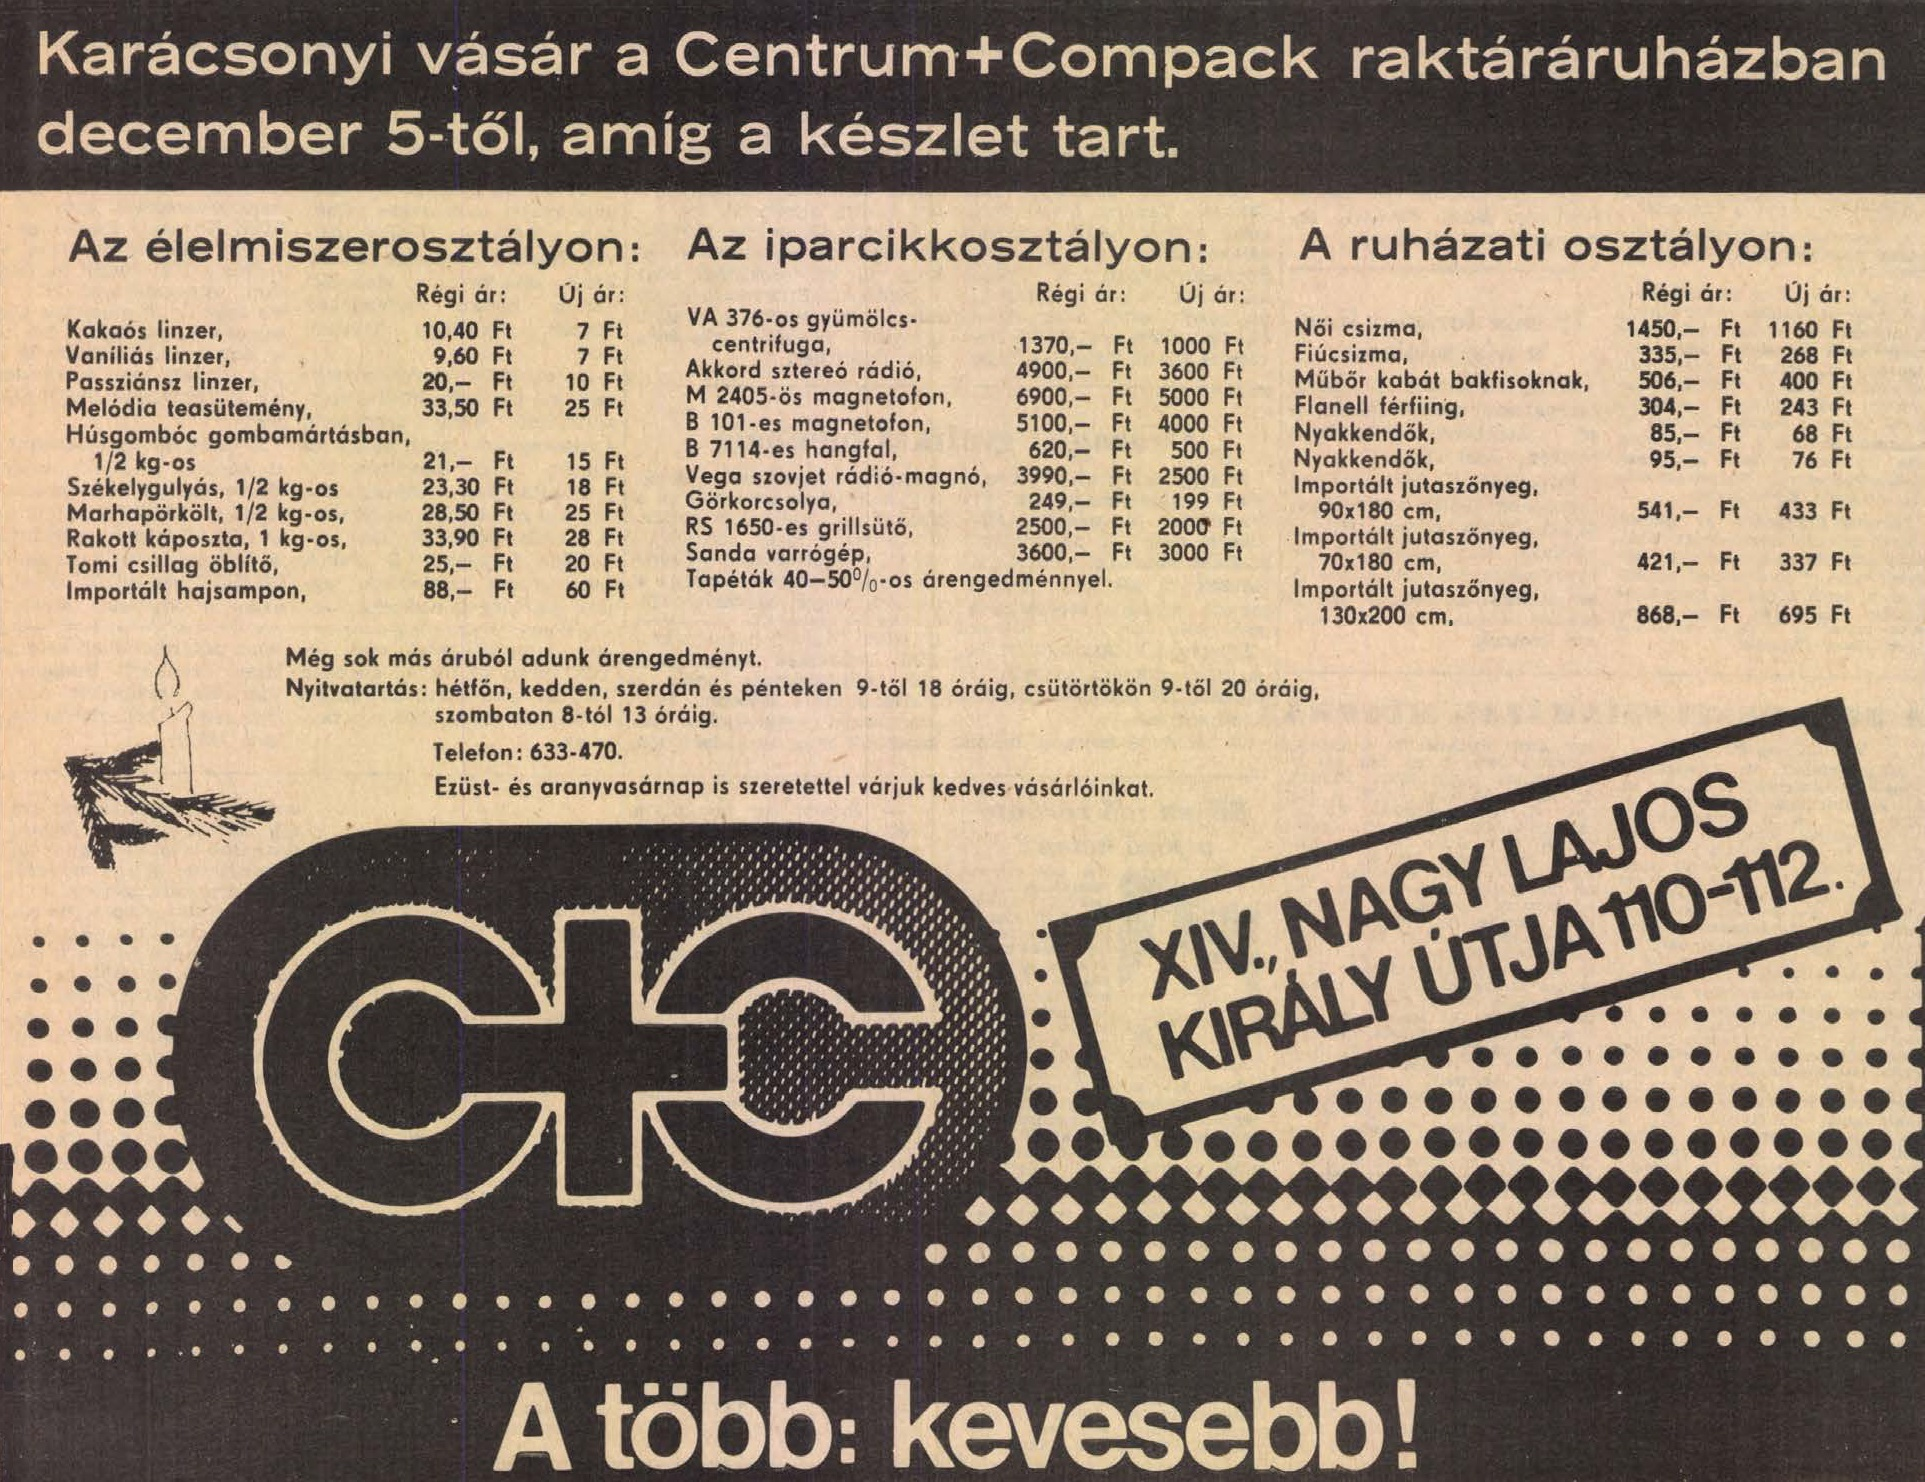 idokapszula_nb_i_1983_84_oszi_zaras_edzoi_gyorsmerleg_1_reklam_2.jpg